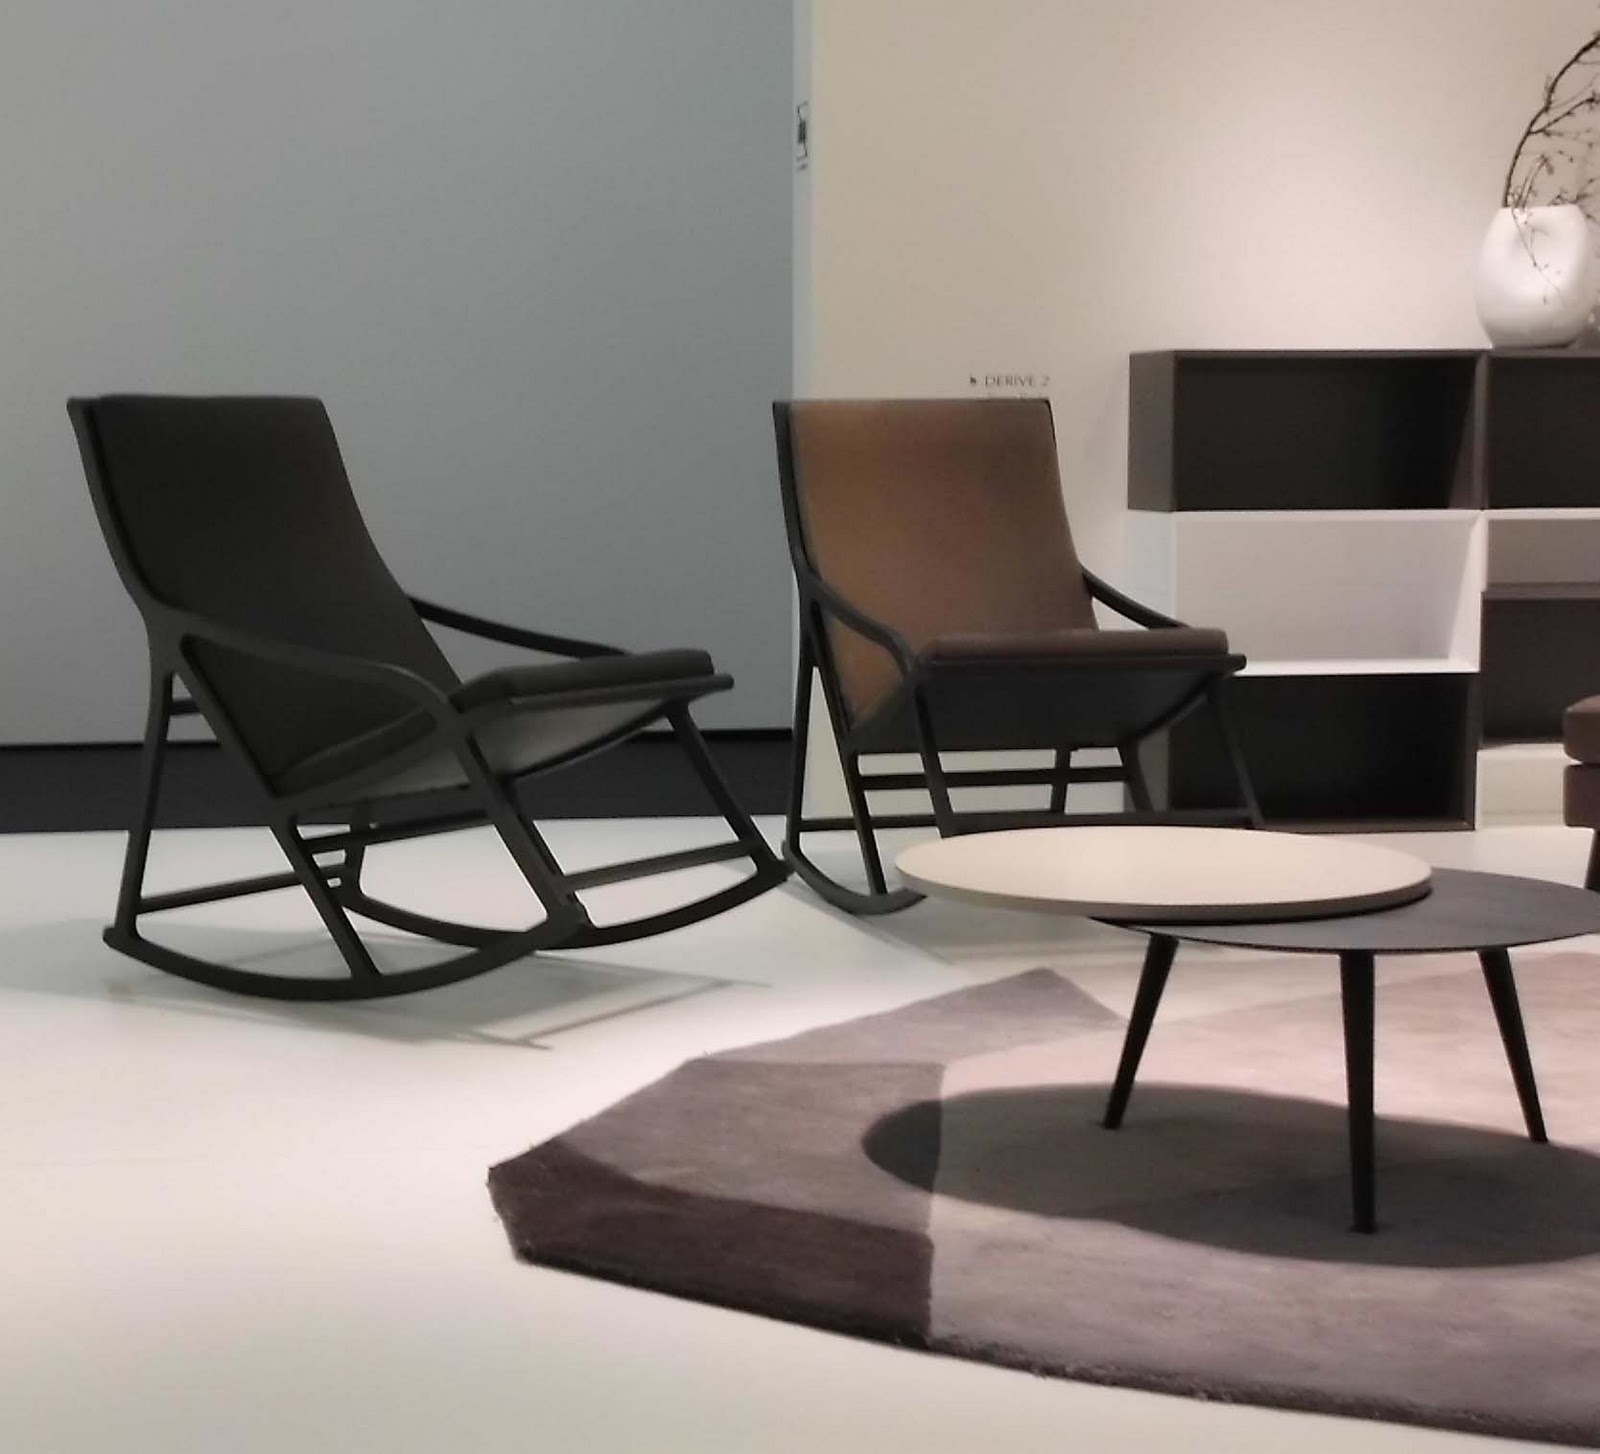 teppich cube ligne roset die neueste innovation der. Black Bedroom Furniture Sets. Home Design Ideas